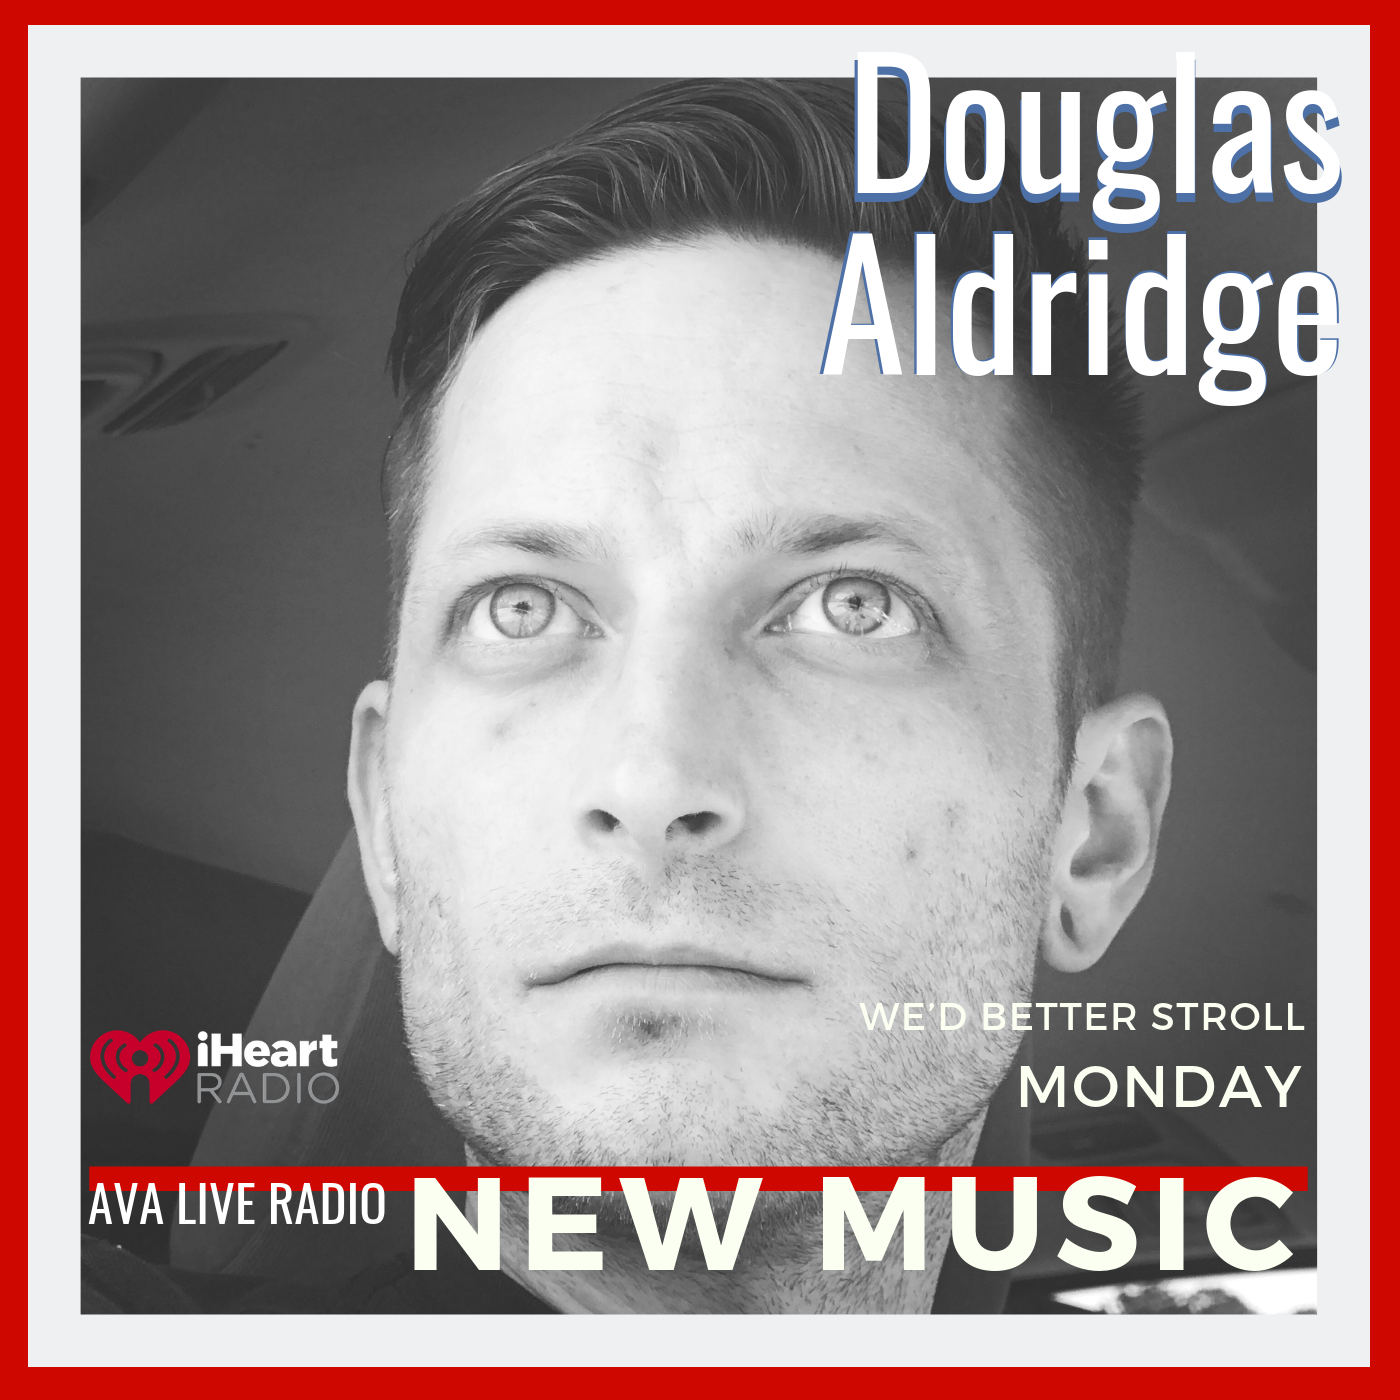 Douglas Aldridge avaliveradio.png